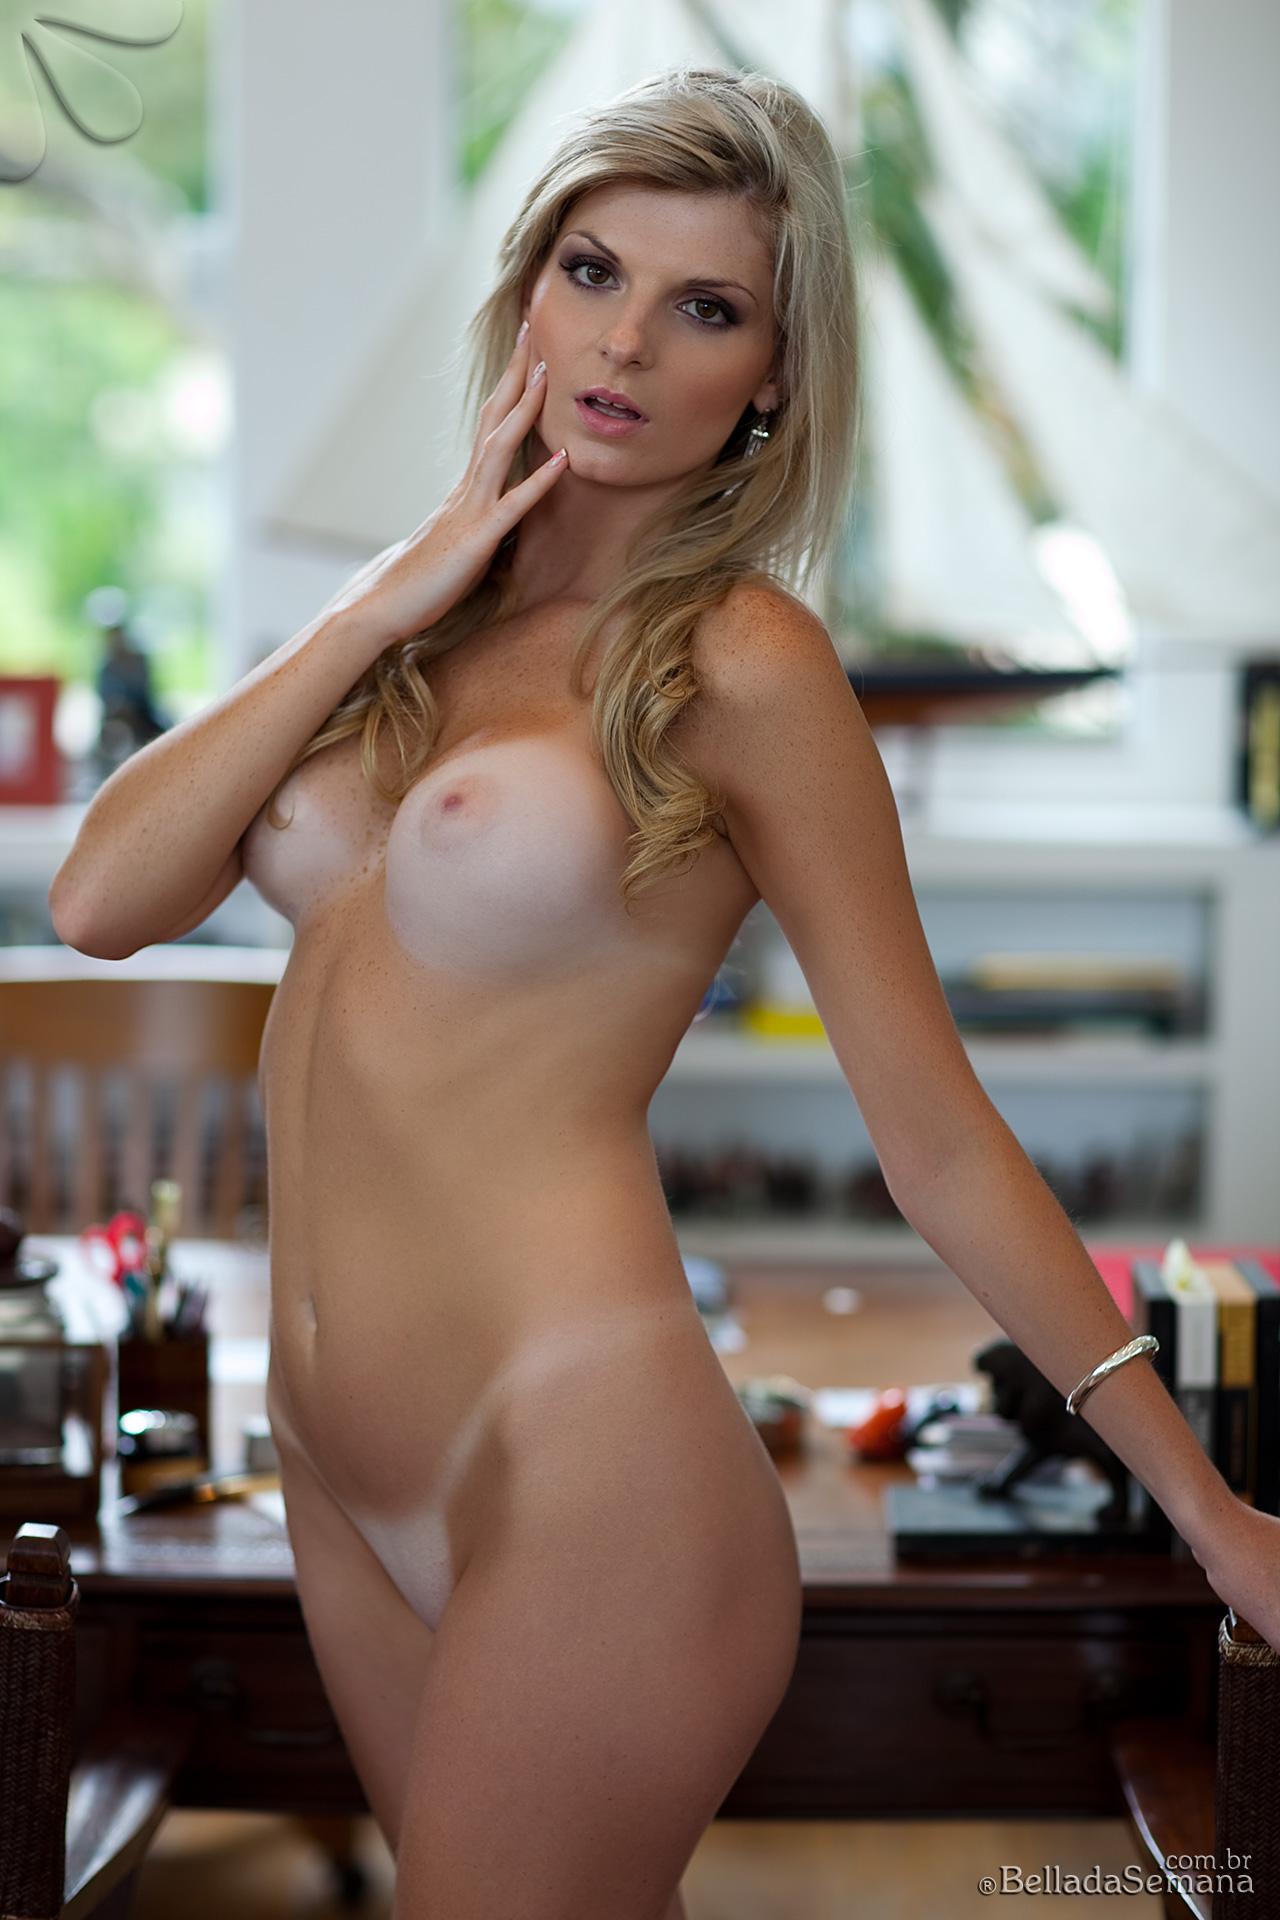 angelica-woicichoski-tan-lines-blonde-brazilian-bella-da-semana-17